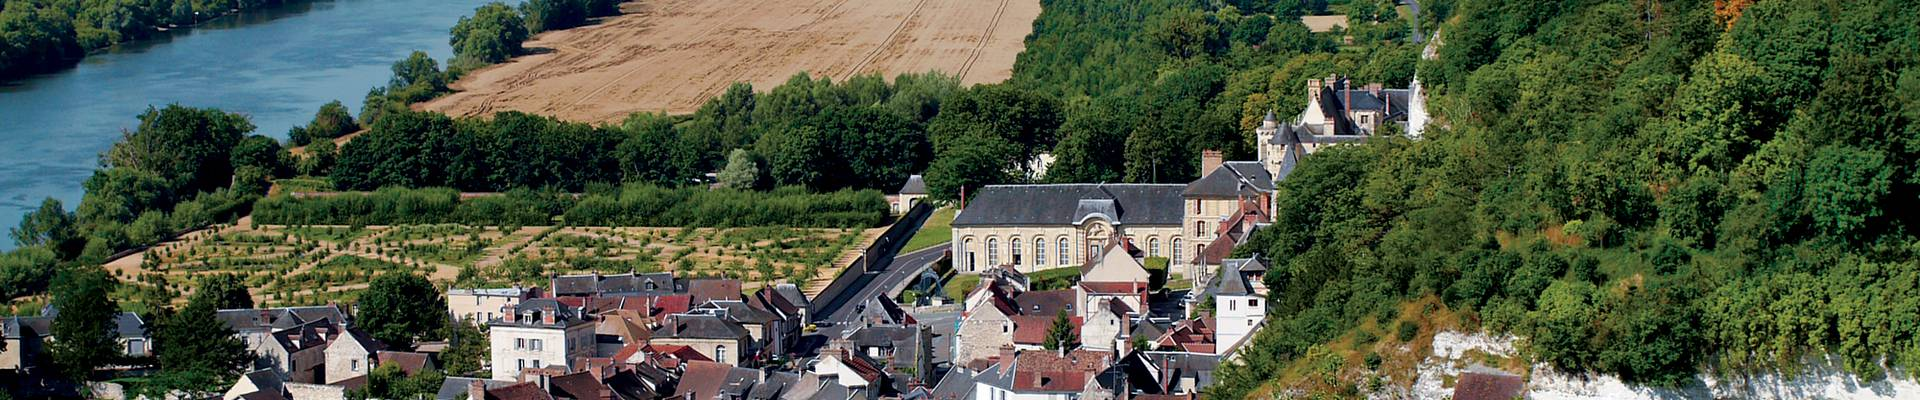 Vue sur La Roche-Guyon